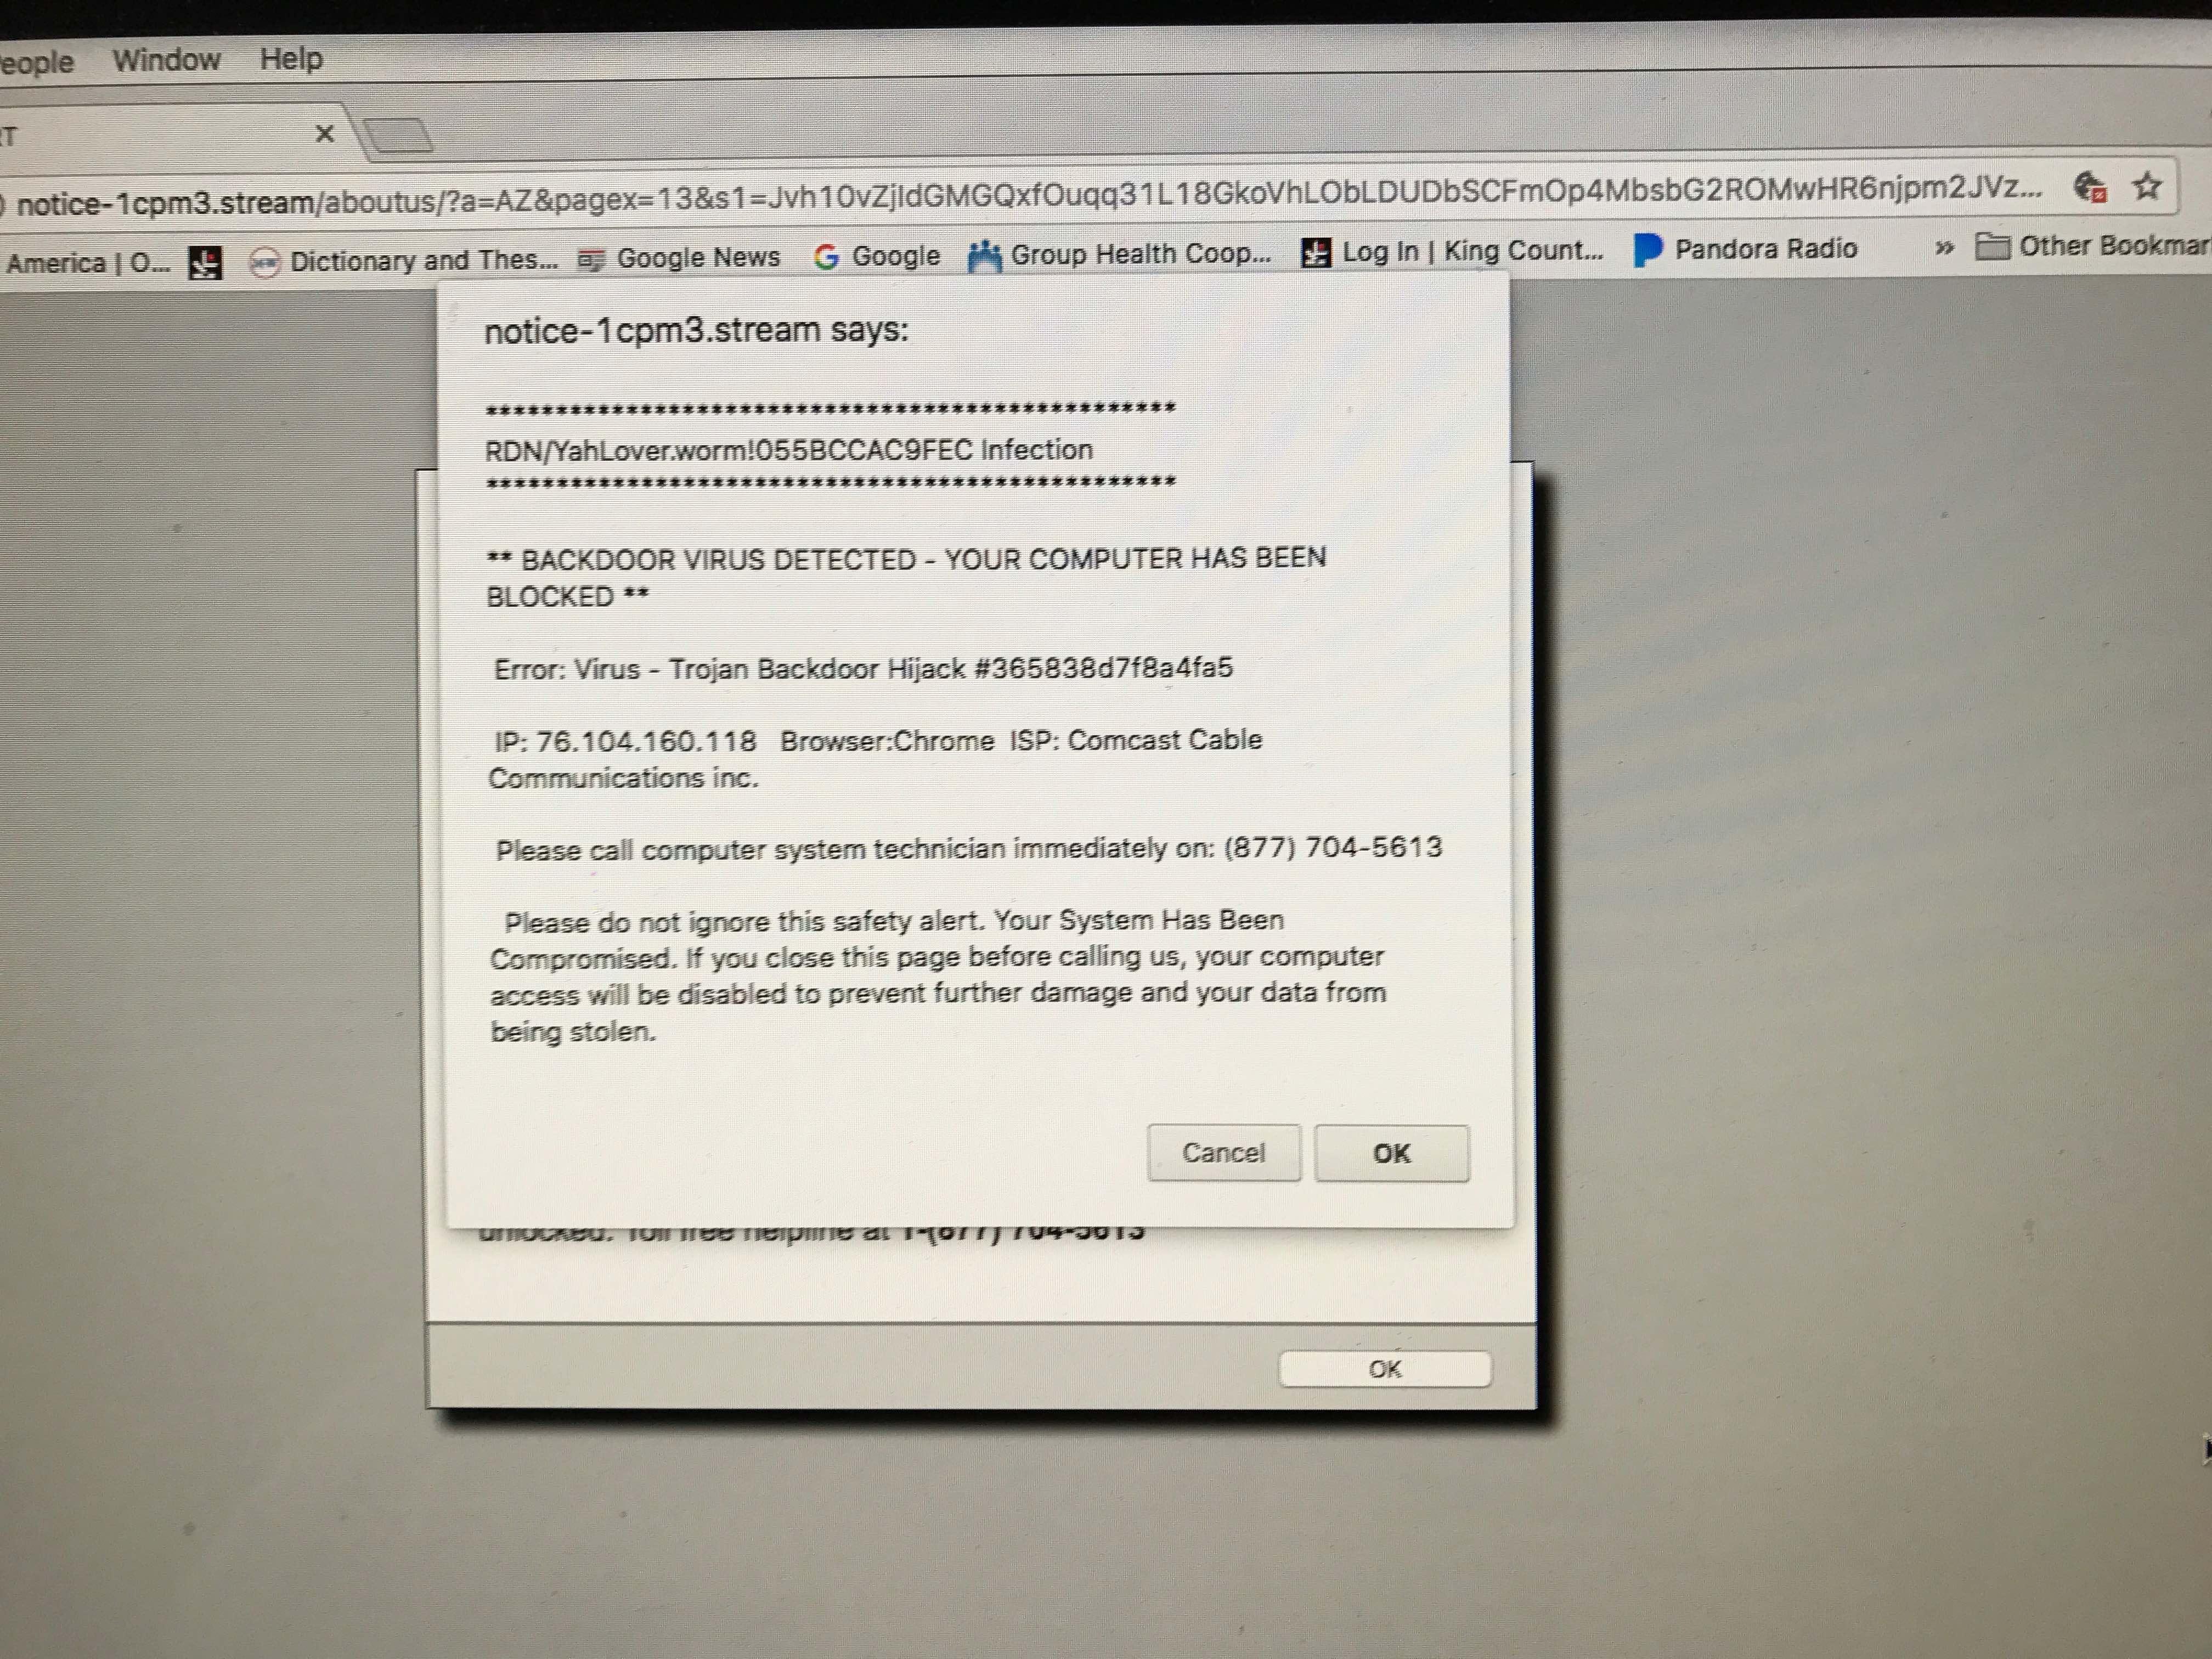 Backdoor Virus pop-up issue - Apple Community